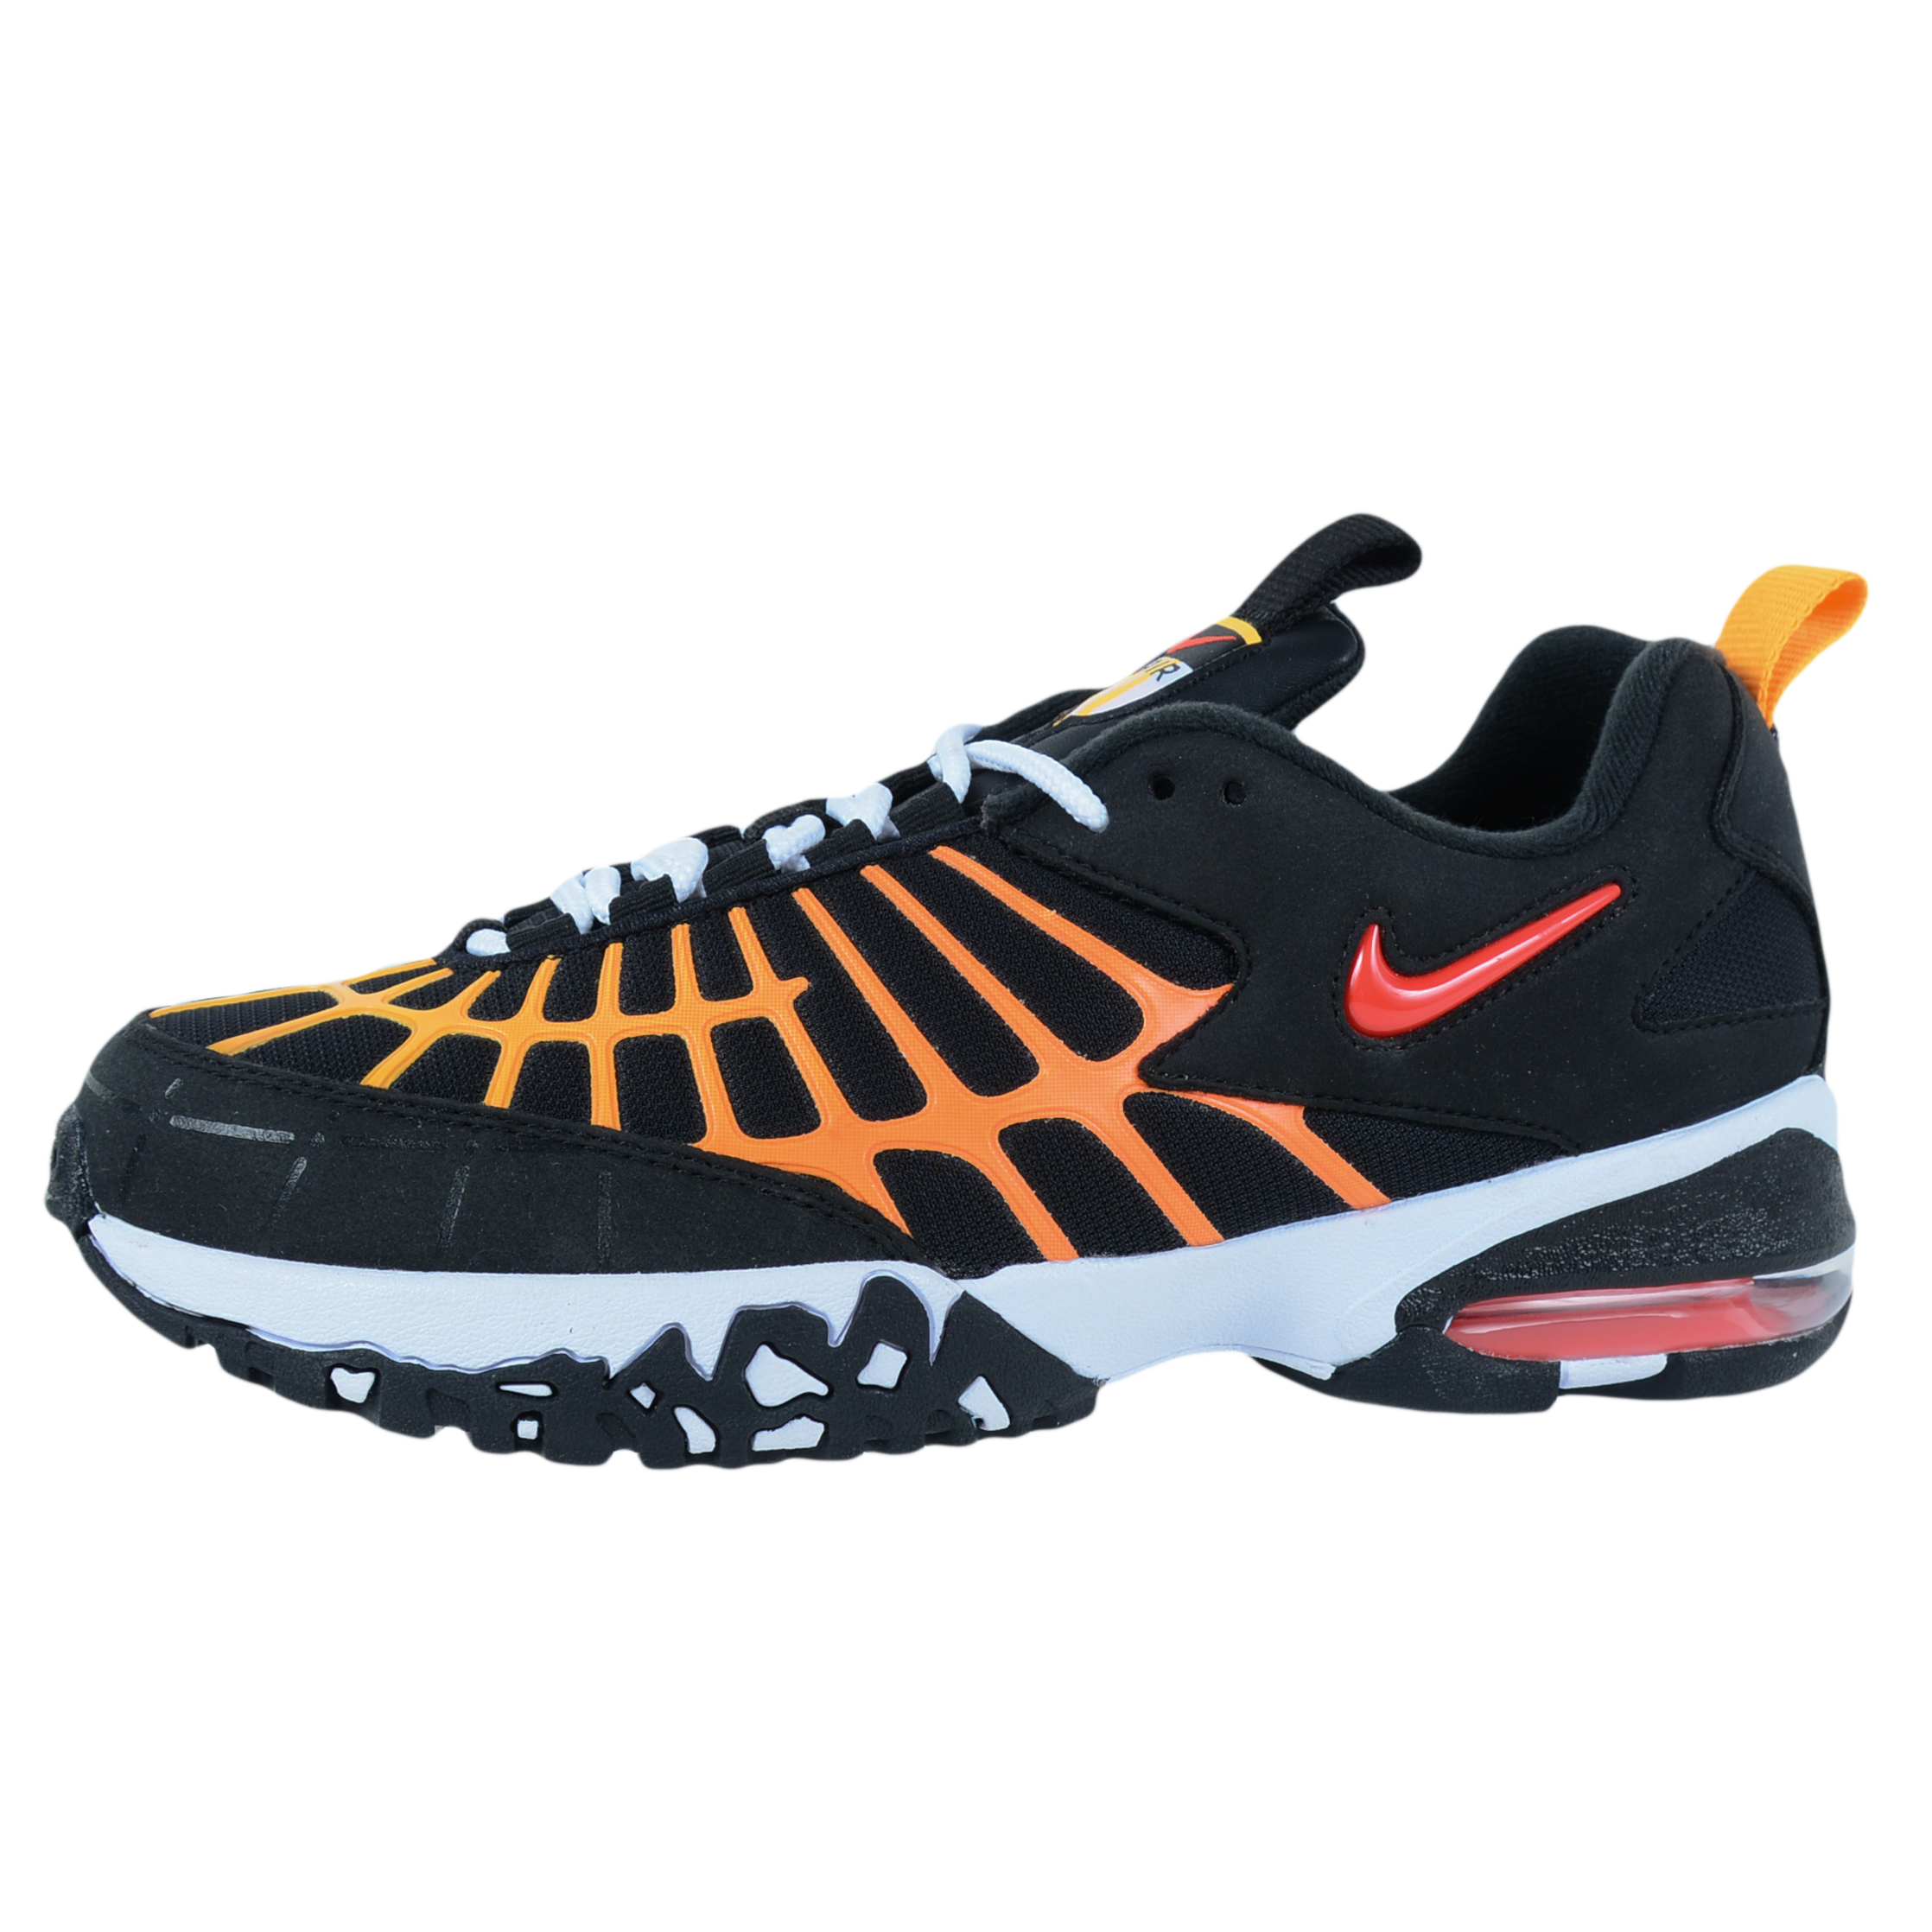 free shipping 82334 597e9 Nike Air Max 120 Laser Orange beardownproductions.co.uk